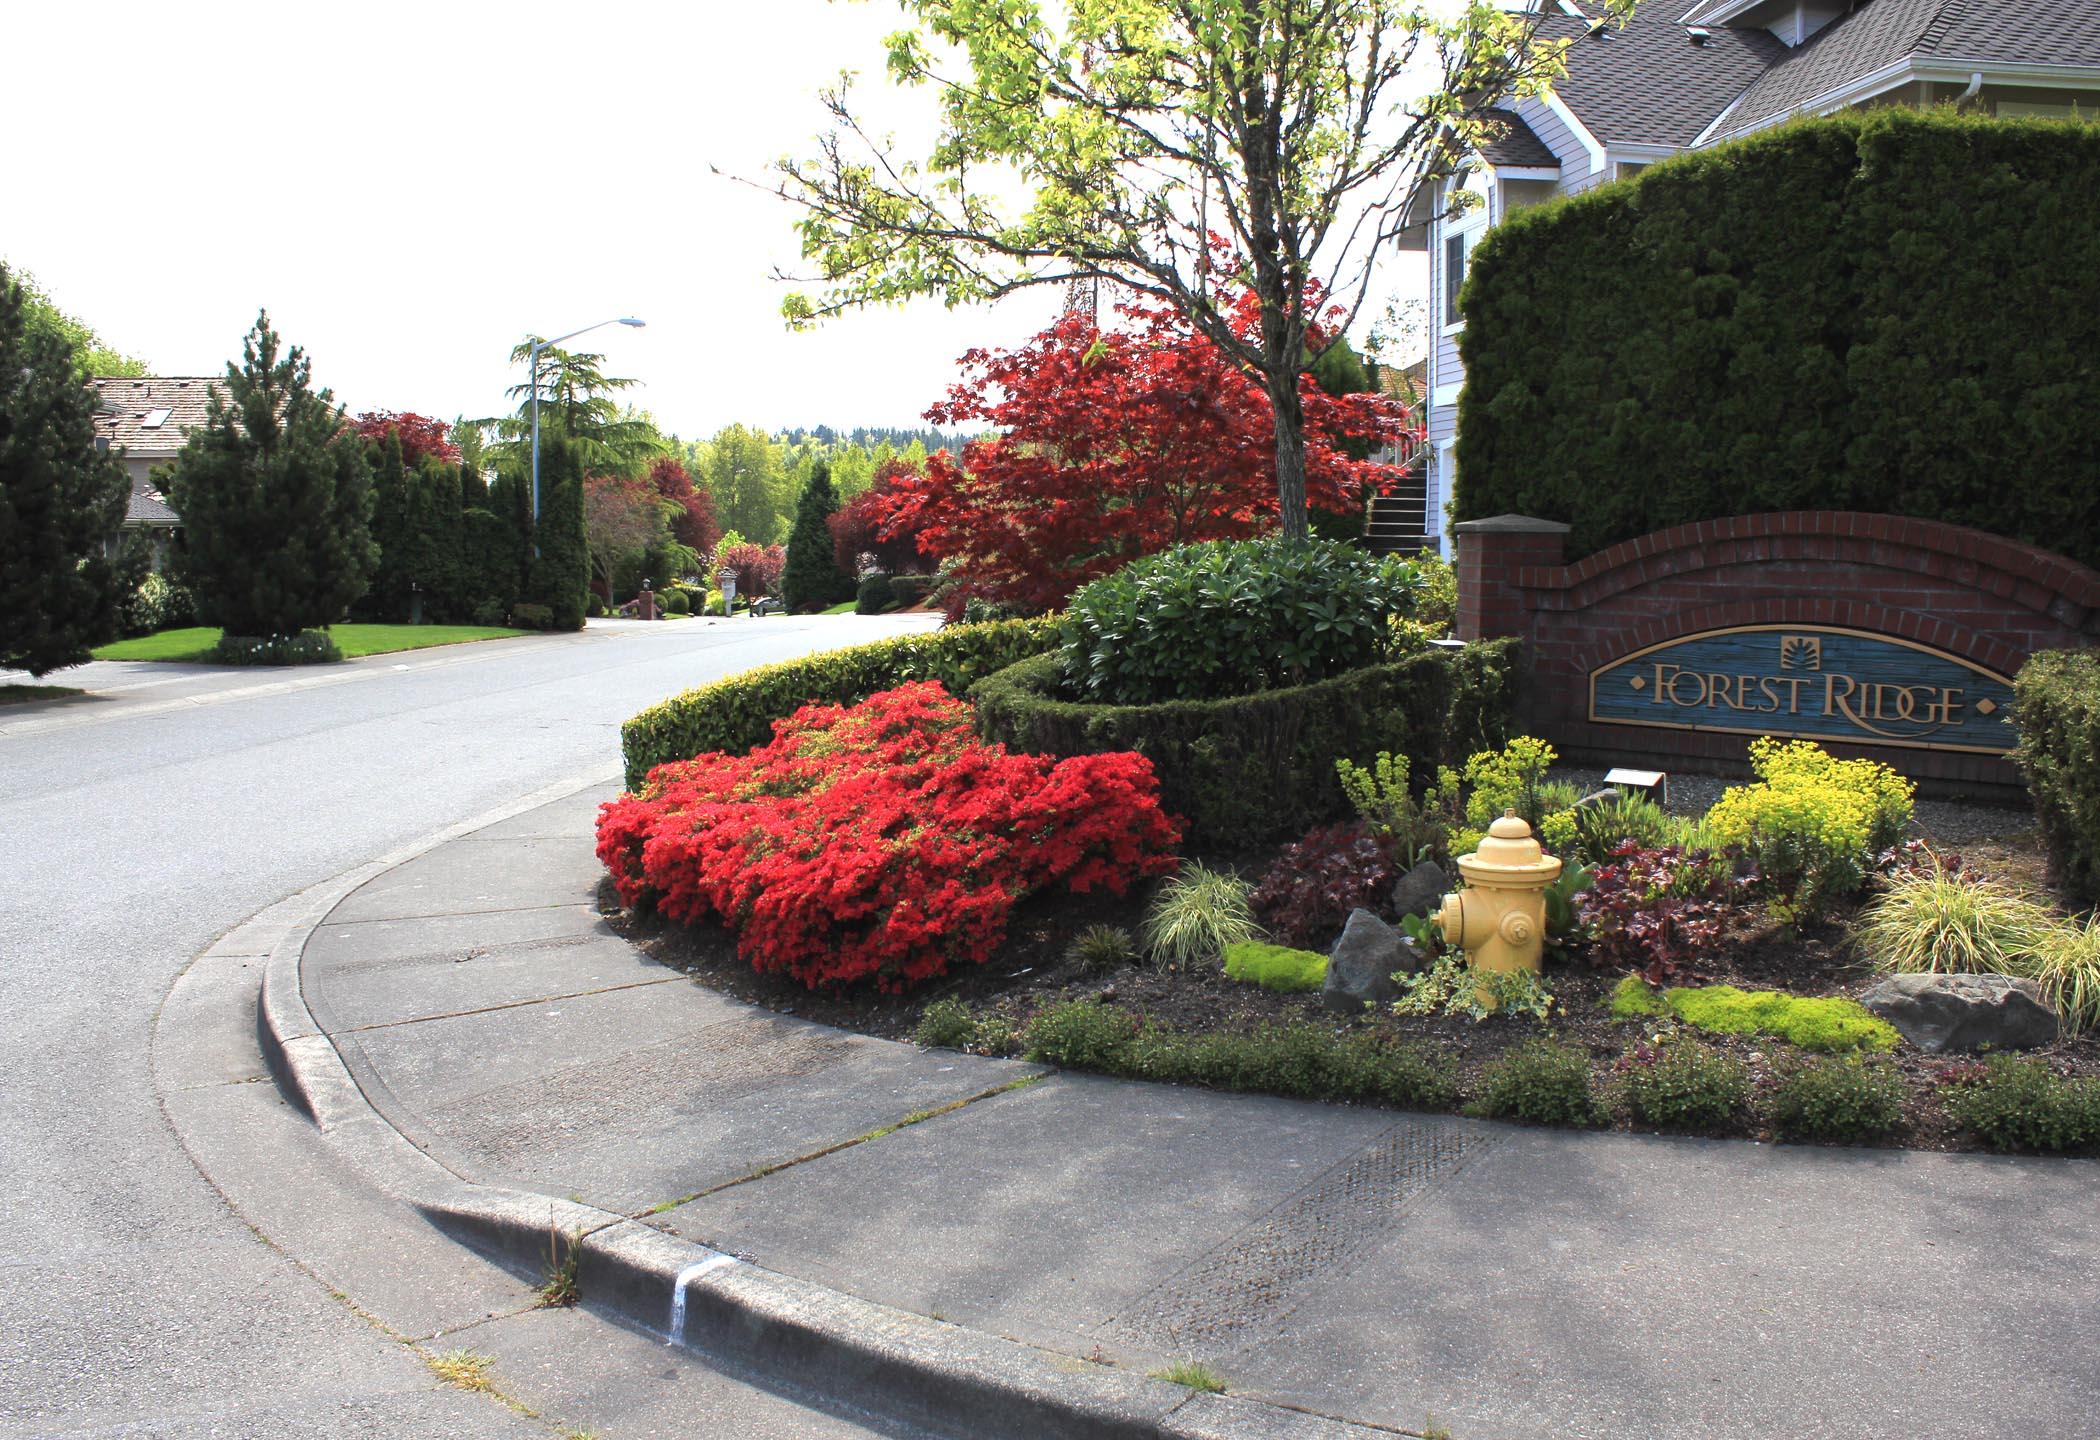 Forest Ridge Homes For Sale Bellevue Wa